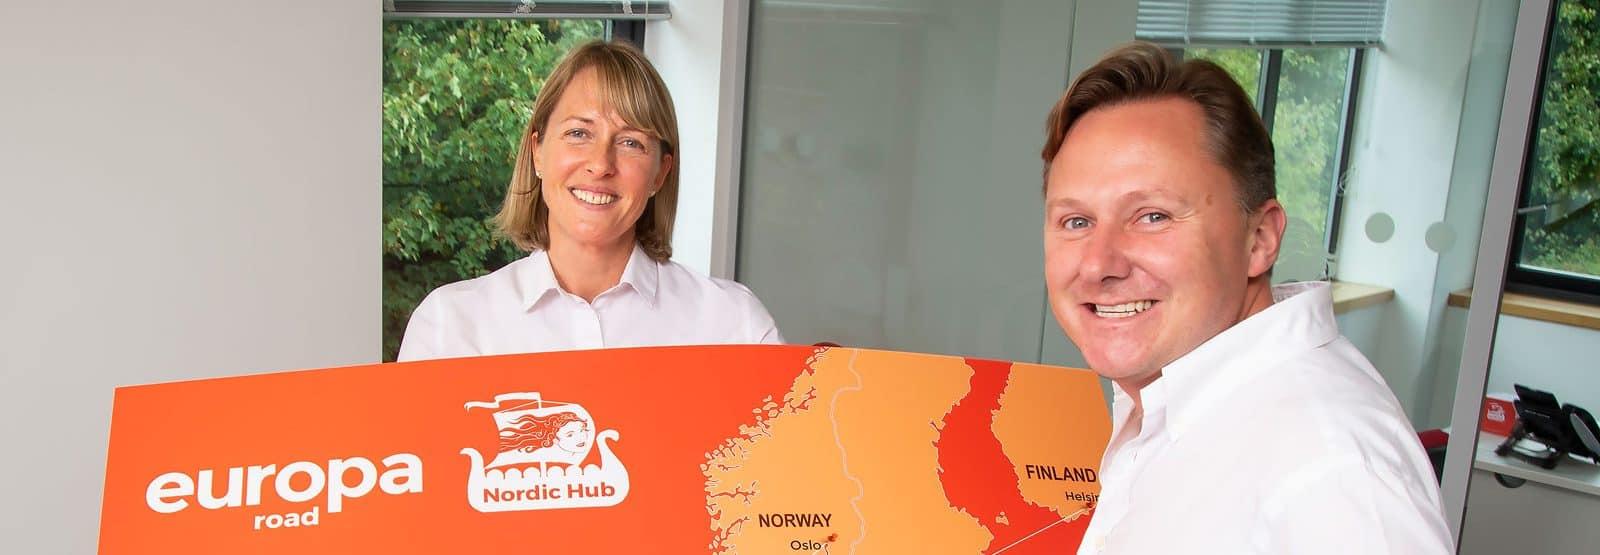 Nordic Hub, Europa Road